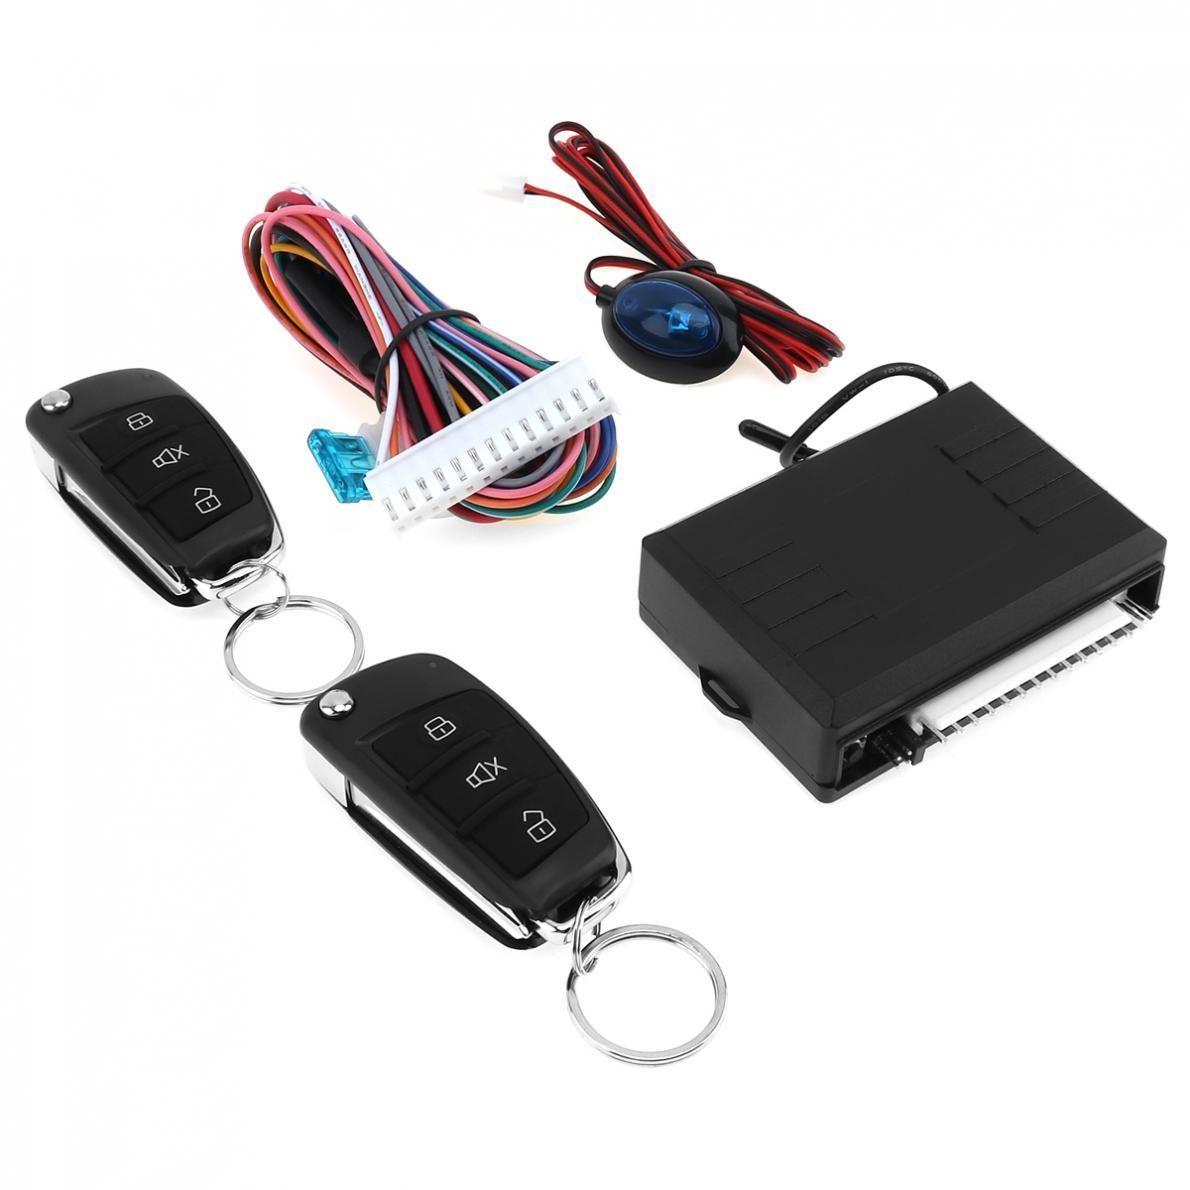 DC12V Car Alarm System Vehicle Keyless Entry System with